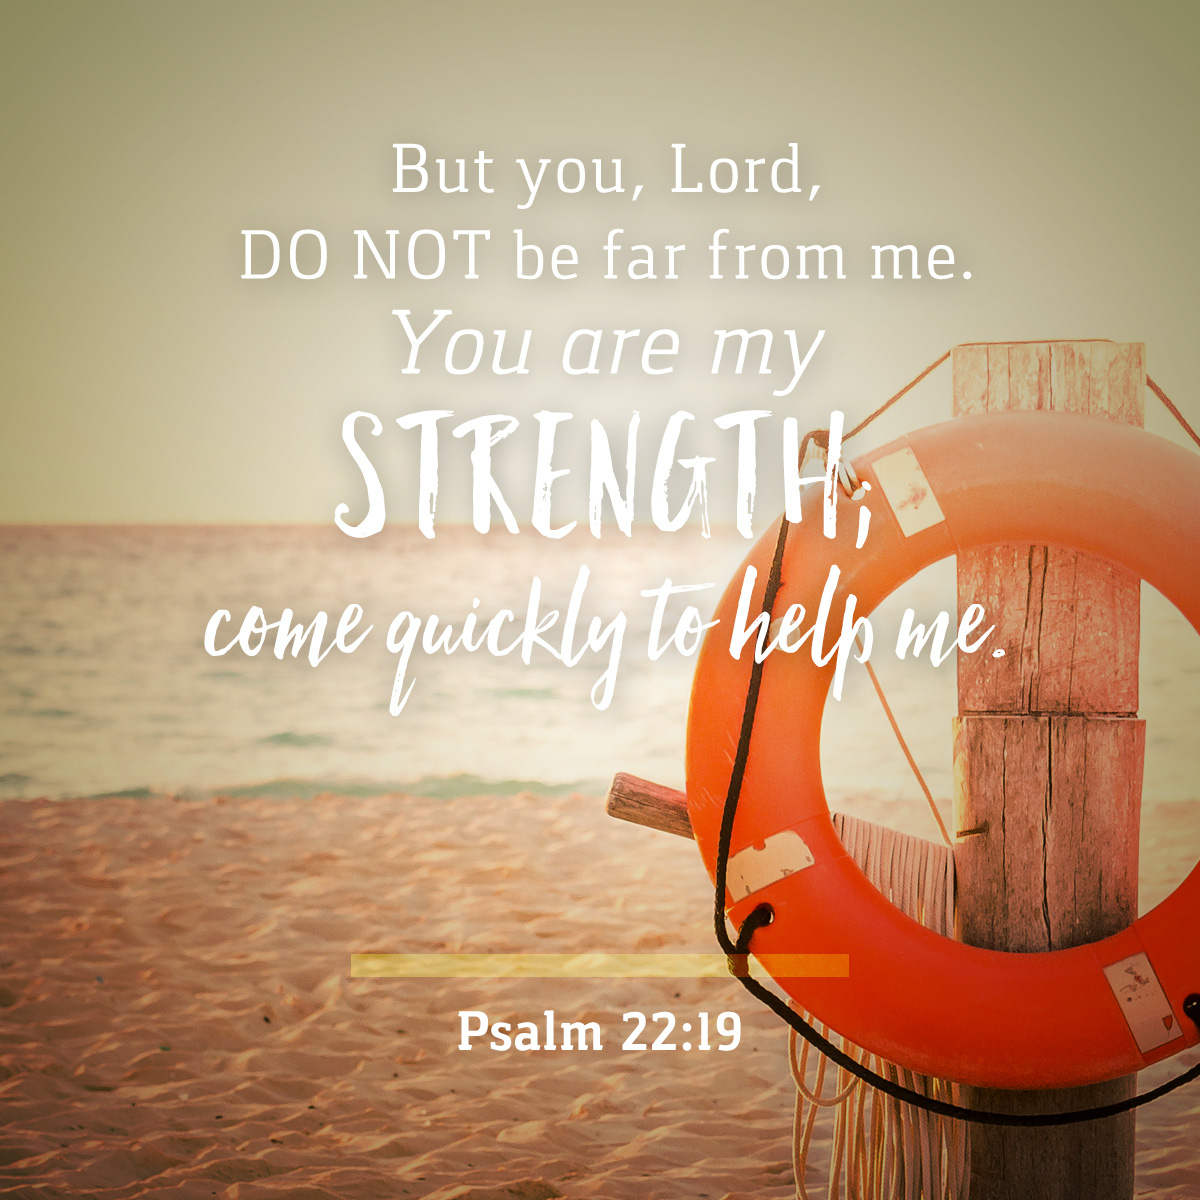 Psalm 22:19